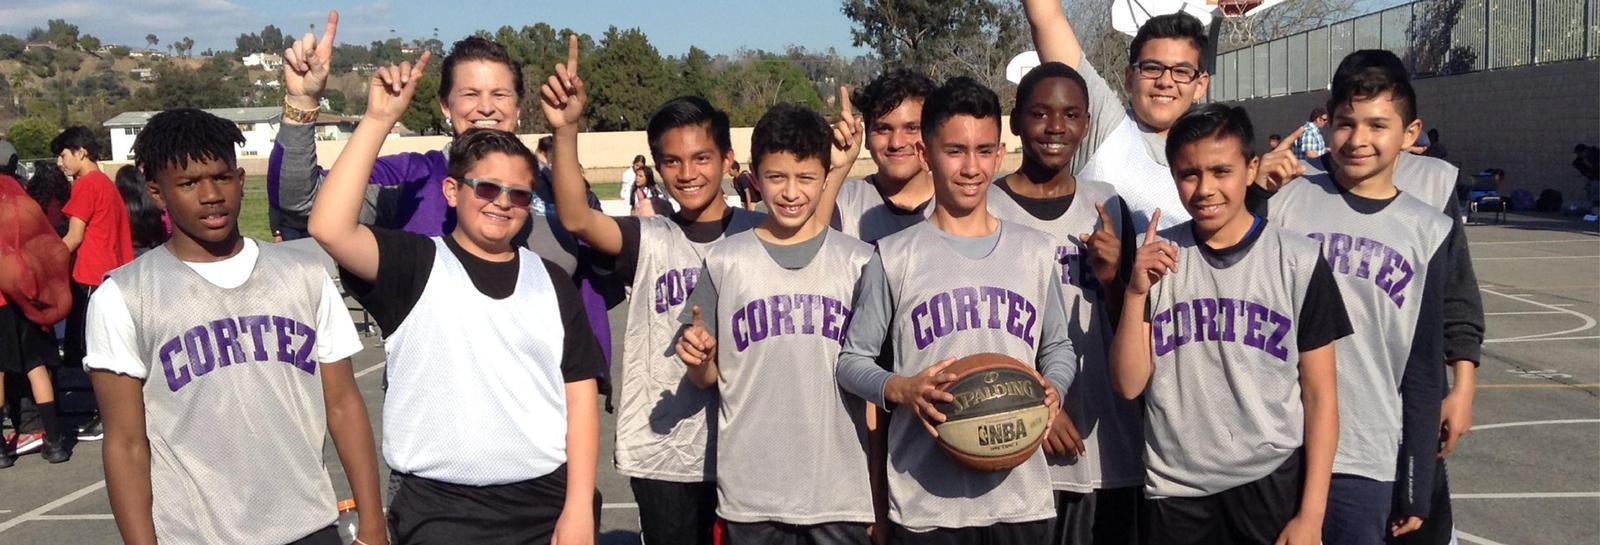 Cortez Basketball